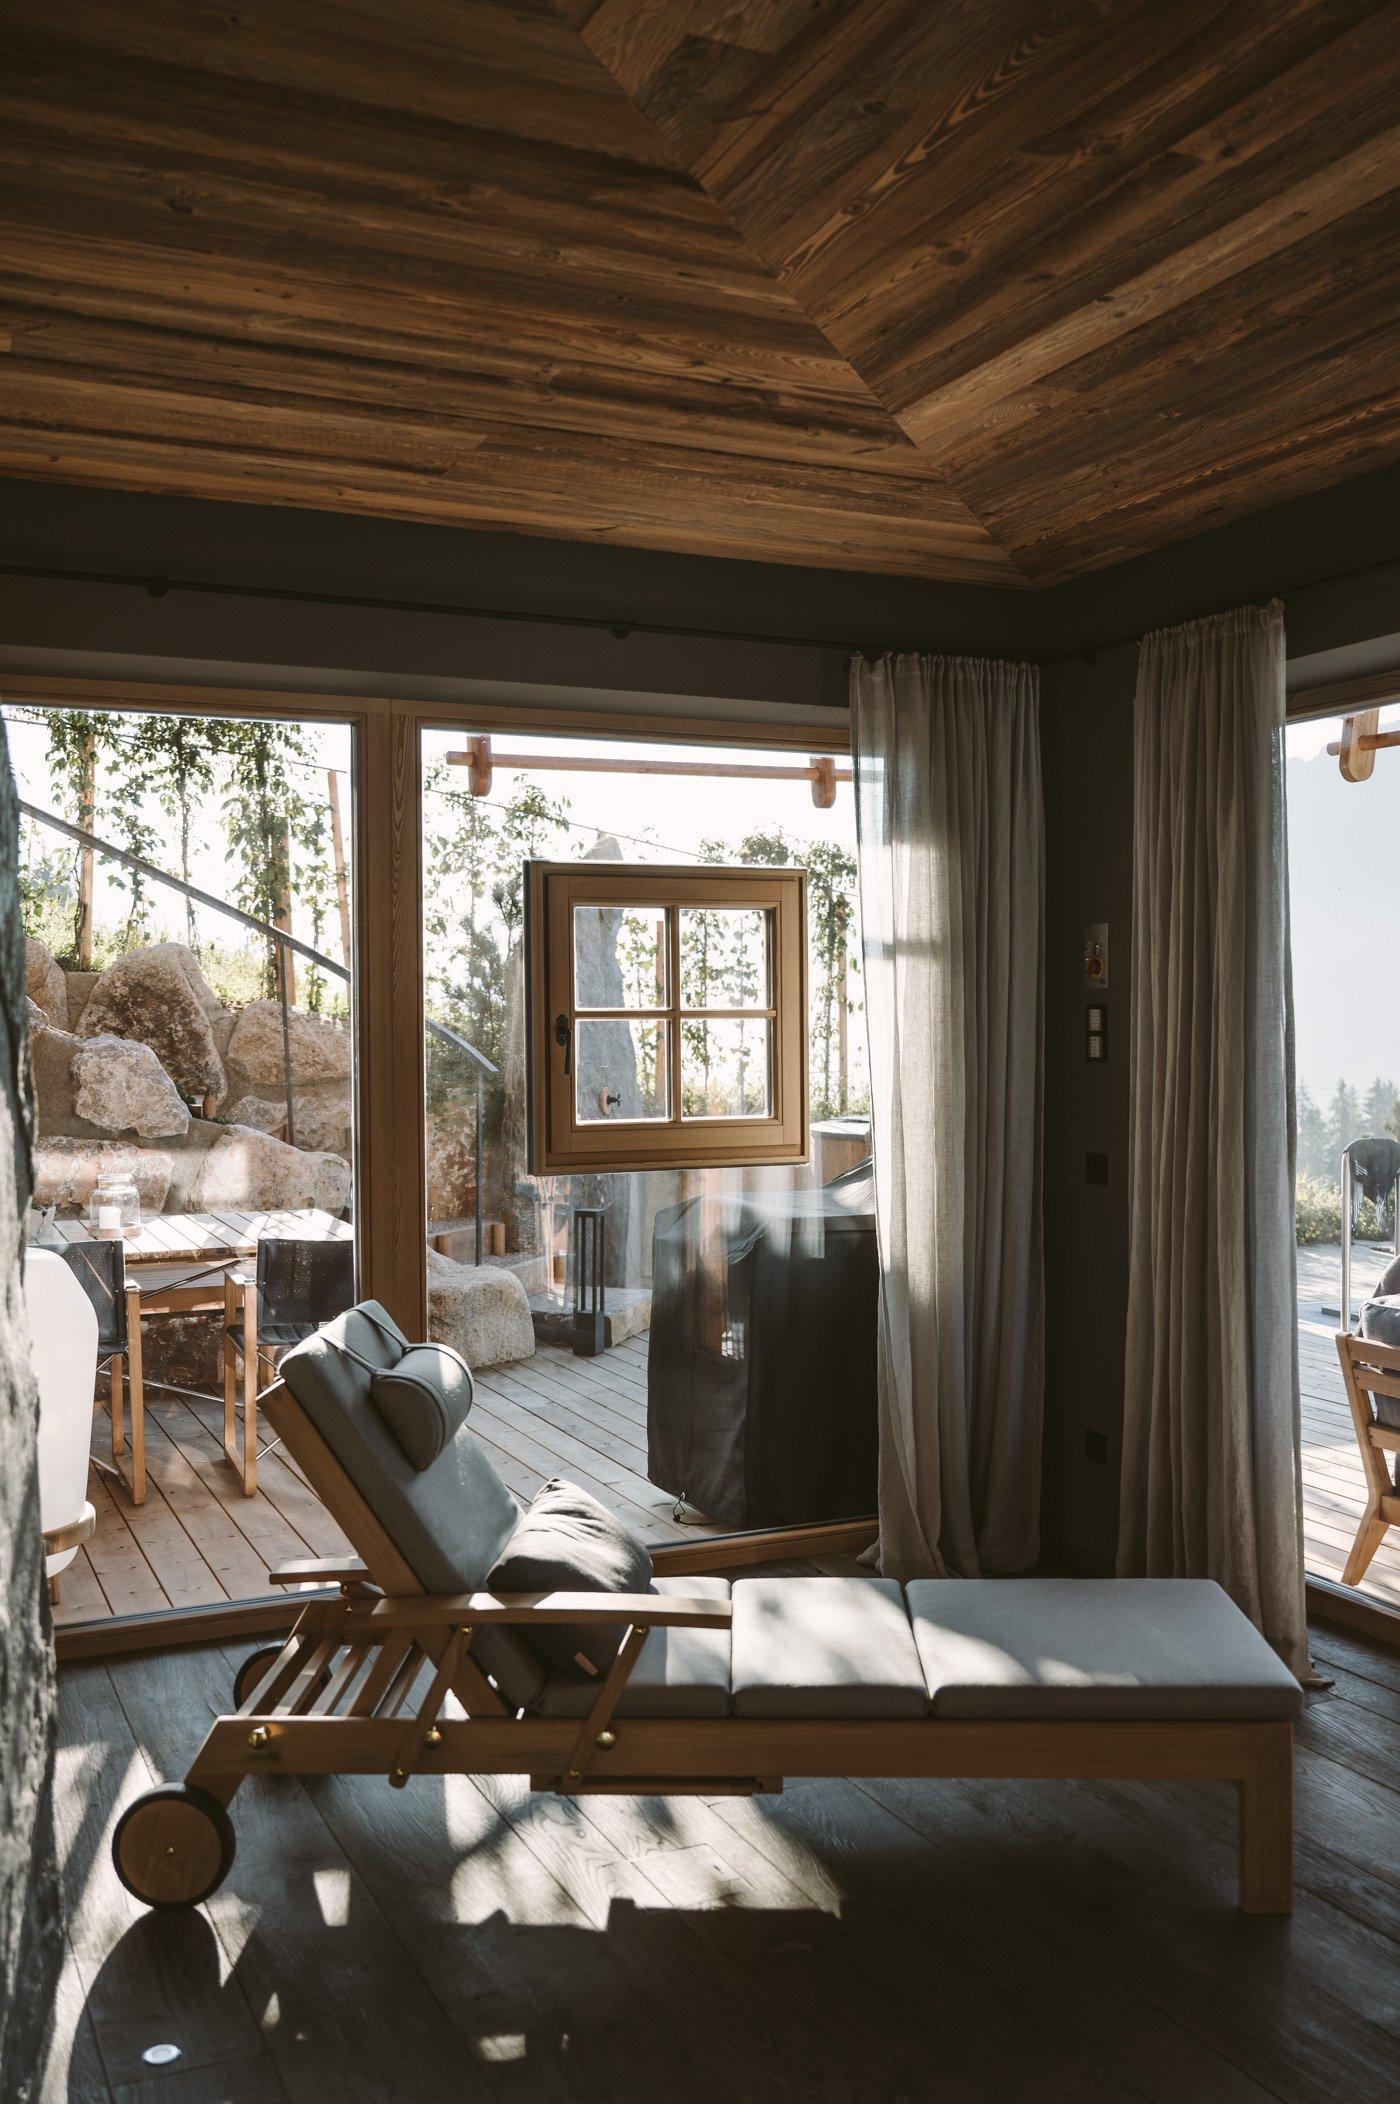 Senhoog luxury holiday homes & chalets in Leogang Salzburg Austria